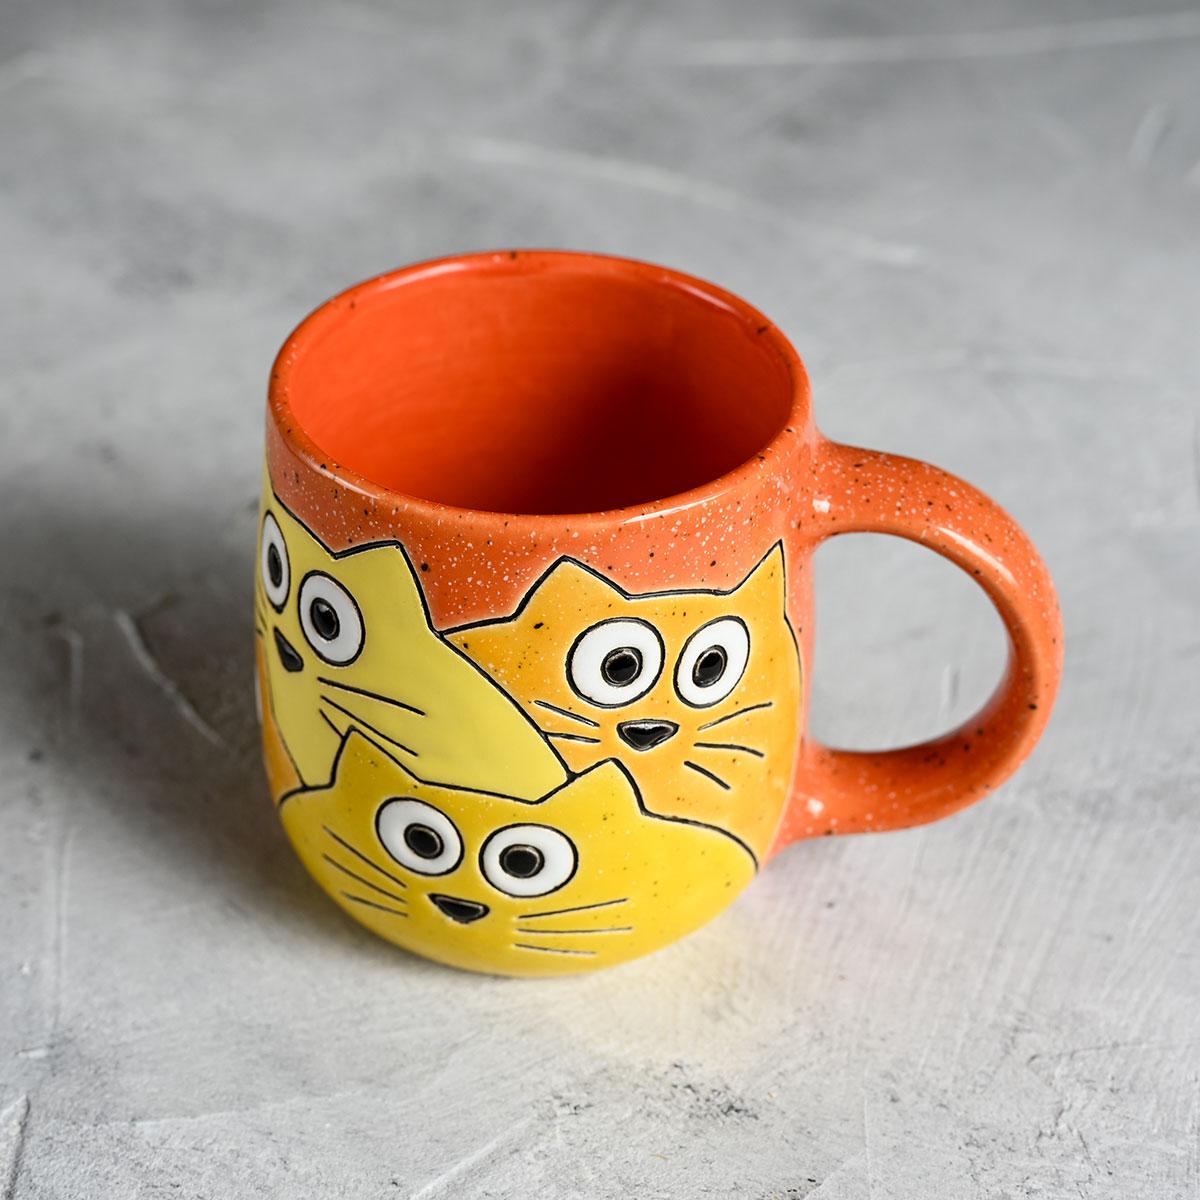 "картинка Кружка ""Котики"" малая оранжевая 220 мл - DishWishes.Ru"